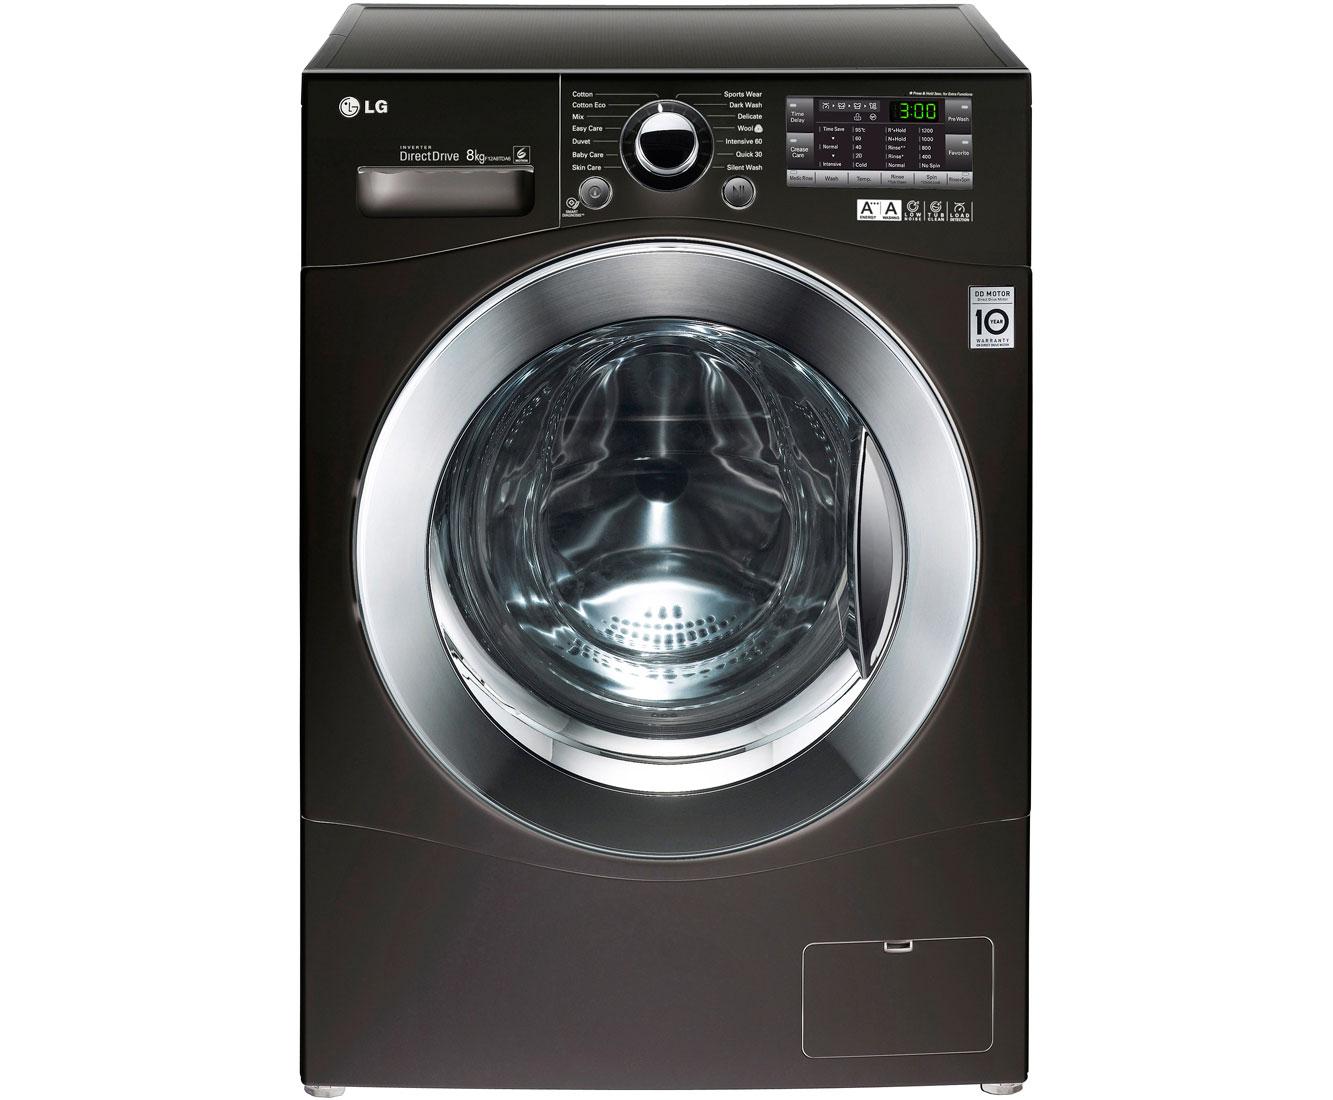 lg 8kg direct drive f12a8tda6 8kg washing machine with 1200 rpm black. Black Bedroom Furniture Sets. Home Design Ideas